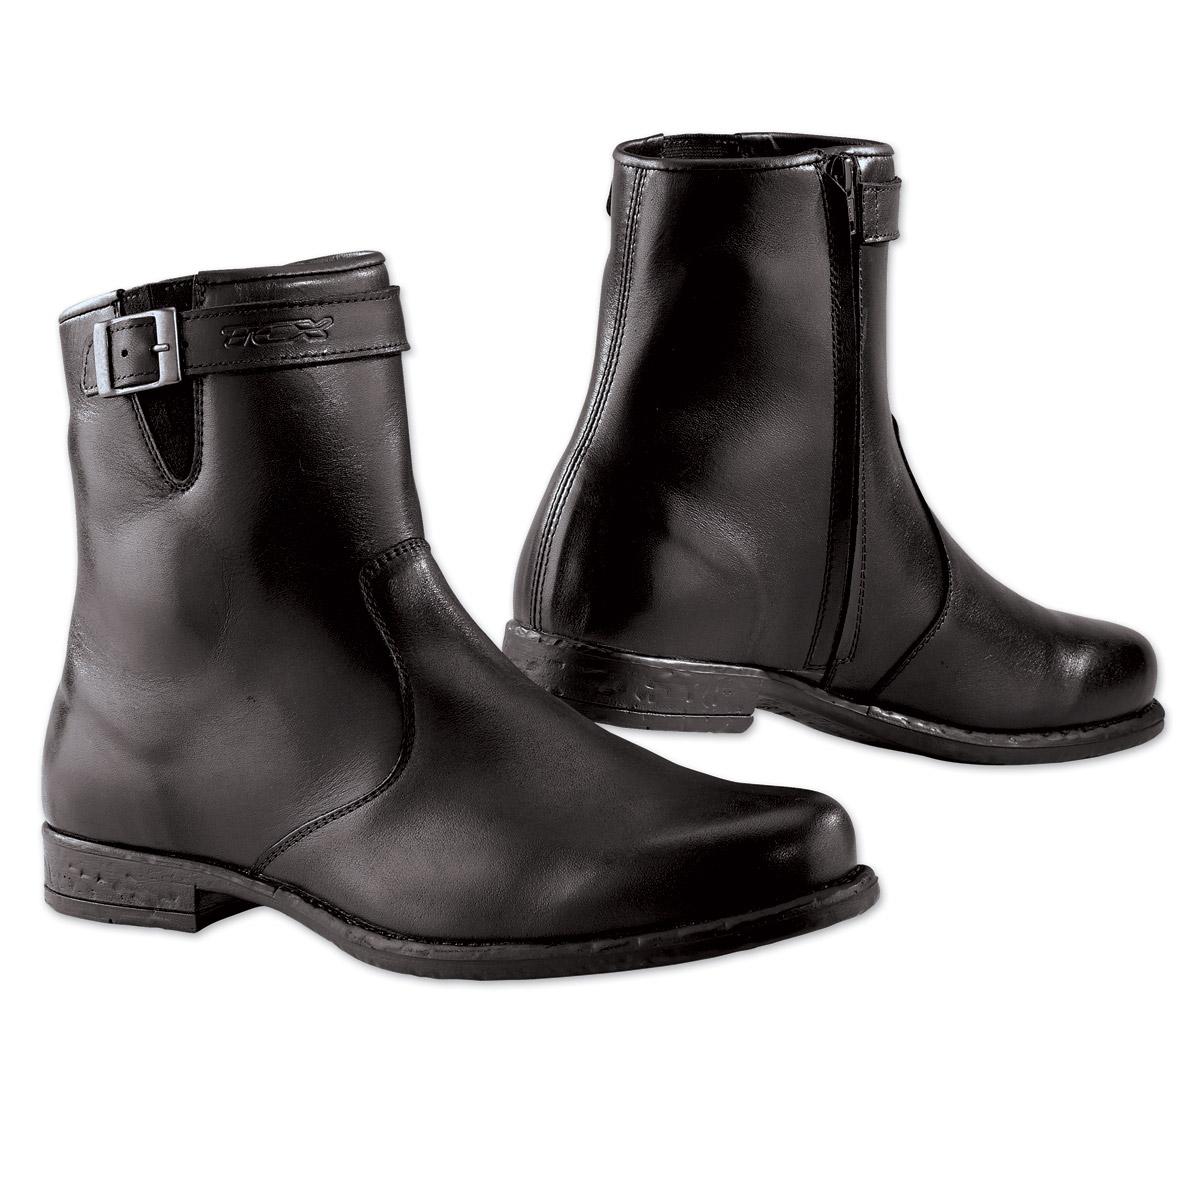 TCX X-Avenue Waterproof Men's Black Boots